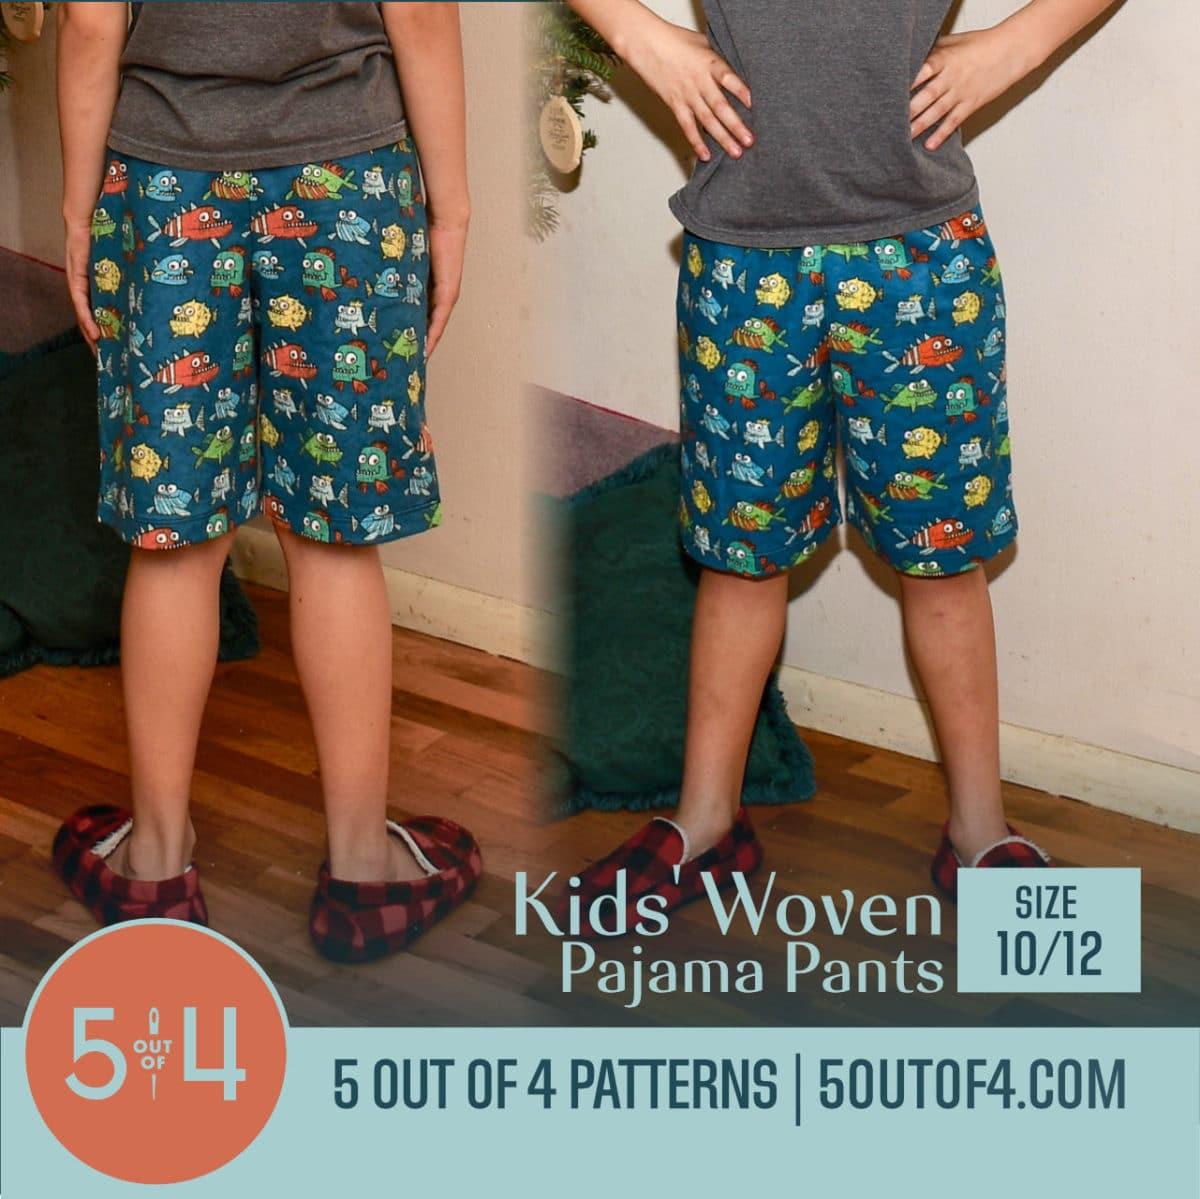 Kids' Woven Pajama Pants size 10:12